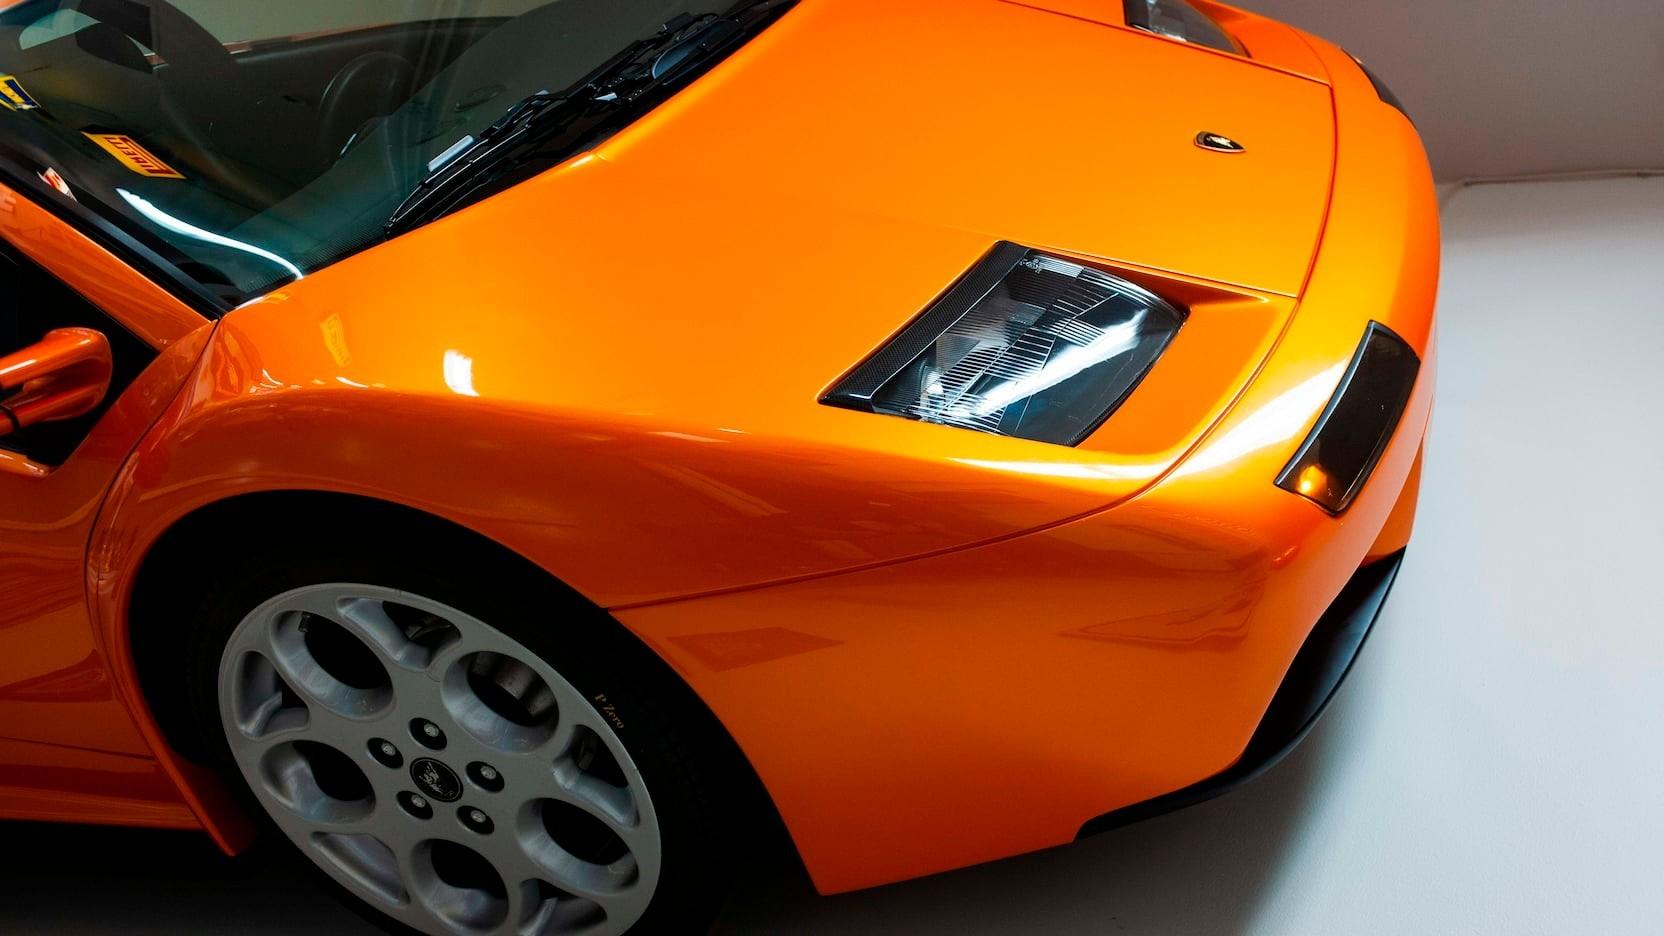 Lamborghini Diablo VT - Lamborghini Diablo VT